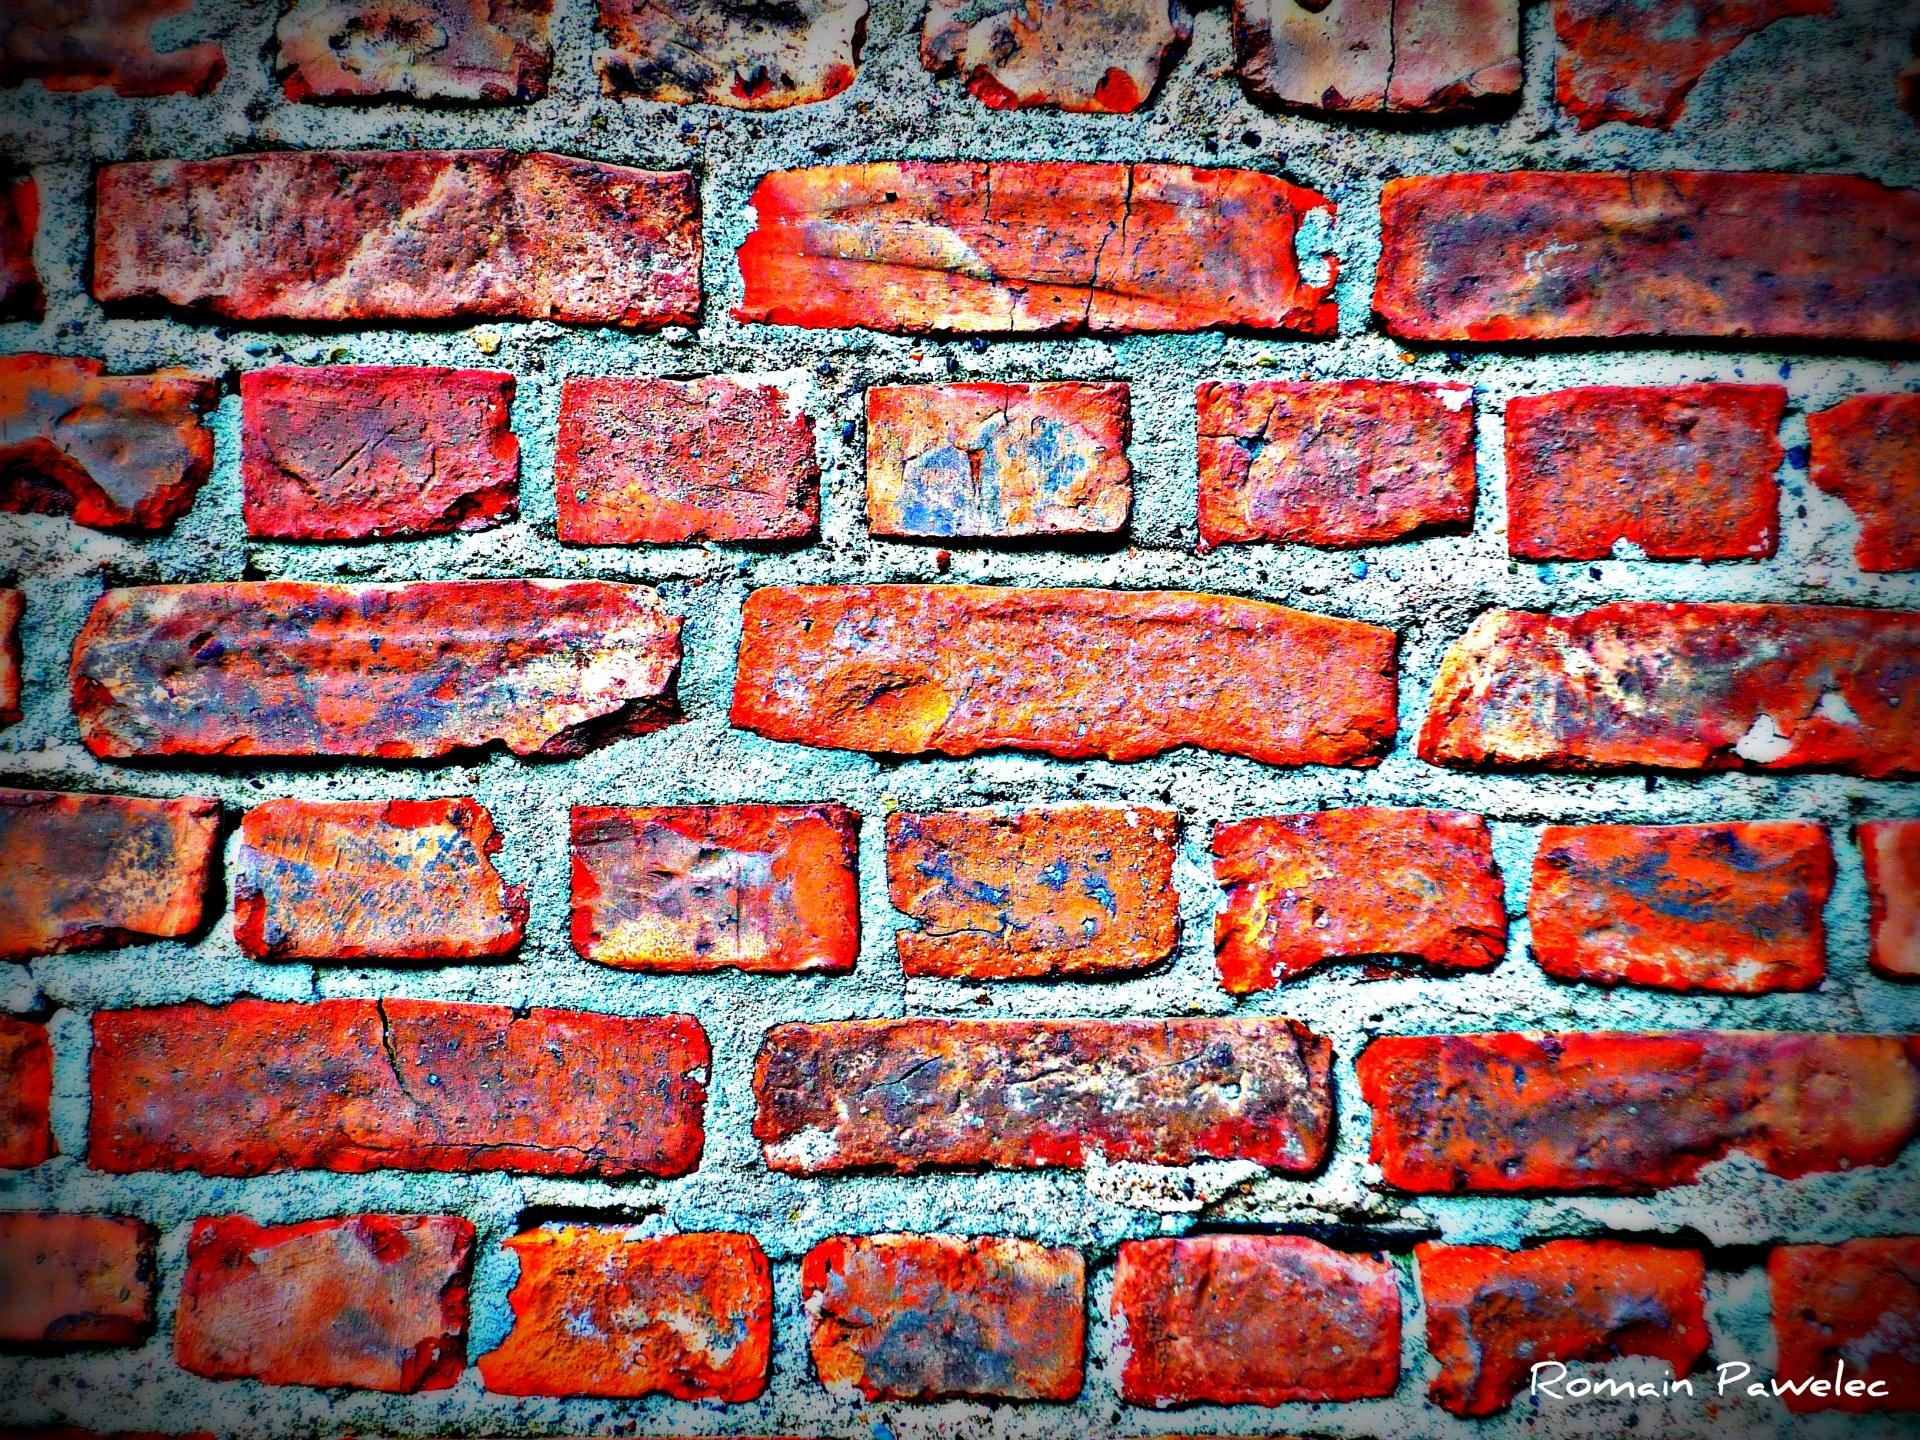 Red brick wallpaper hd desktop wallpapers 4k hd for Brick wallpaper